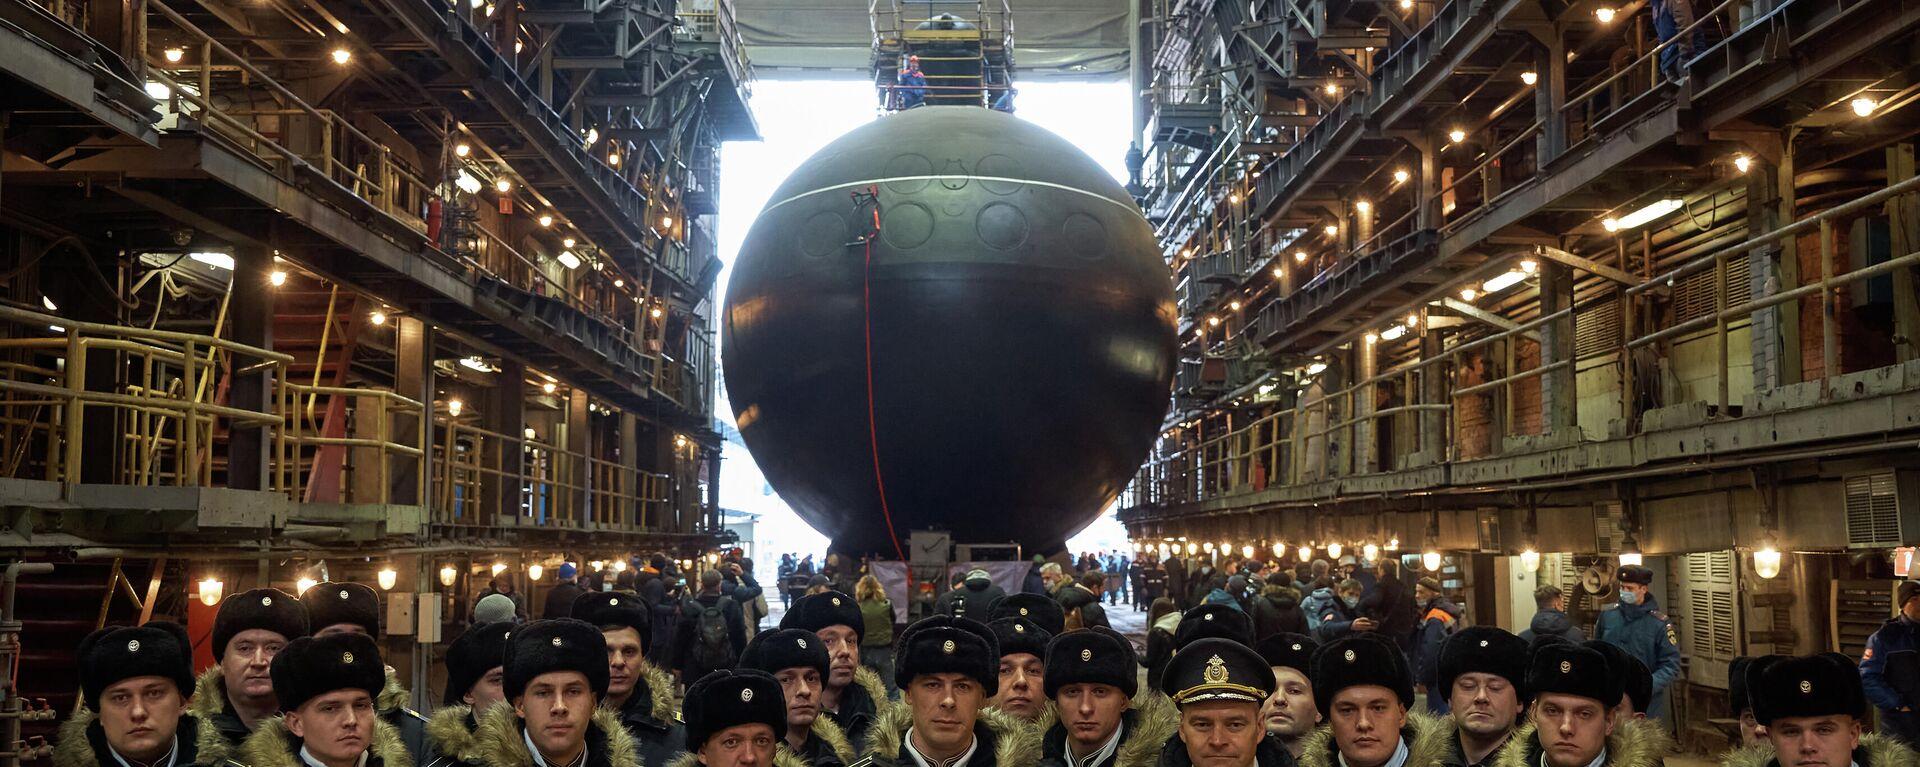 Botadura del submarino ruso Magadan - Sputnik Mundo, 1920, 28.03.2021